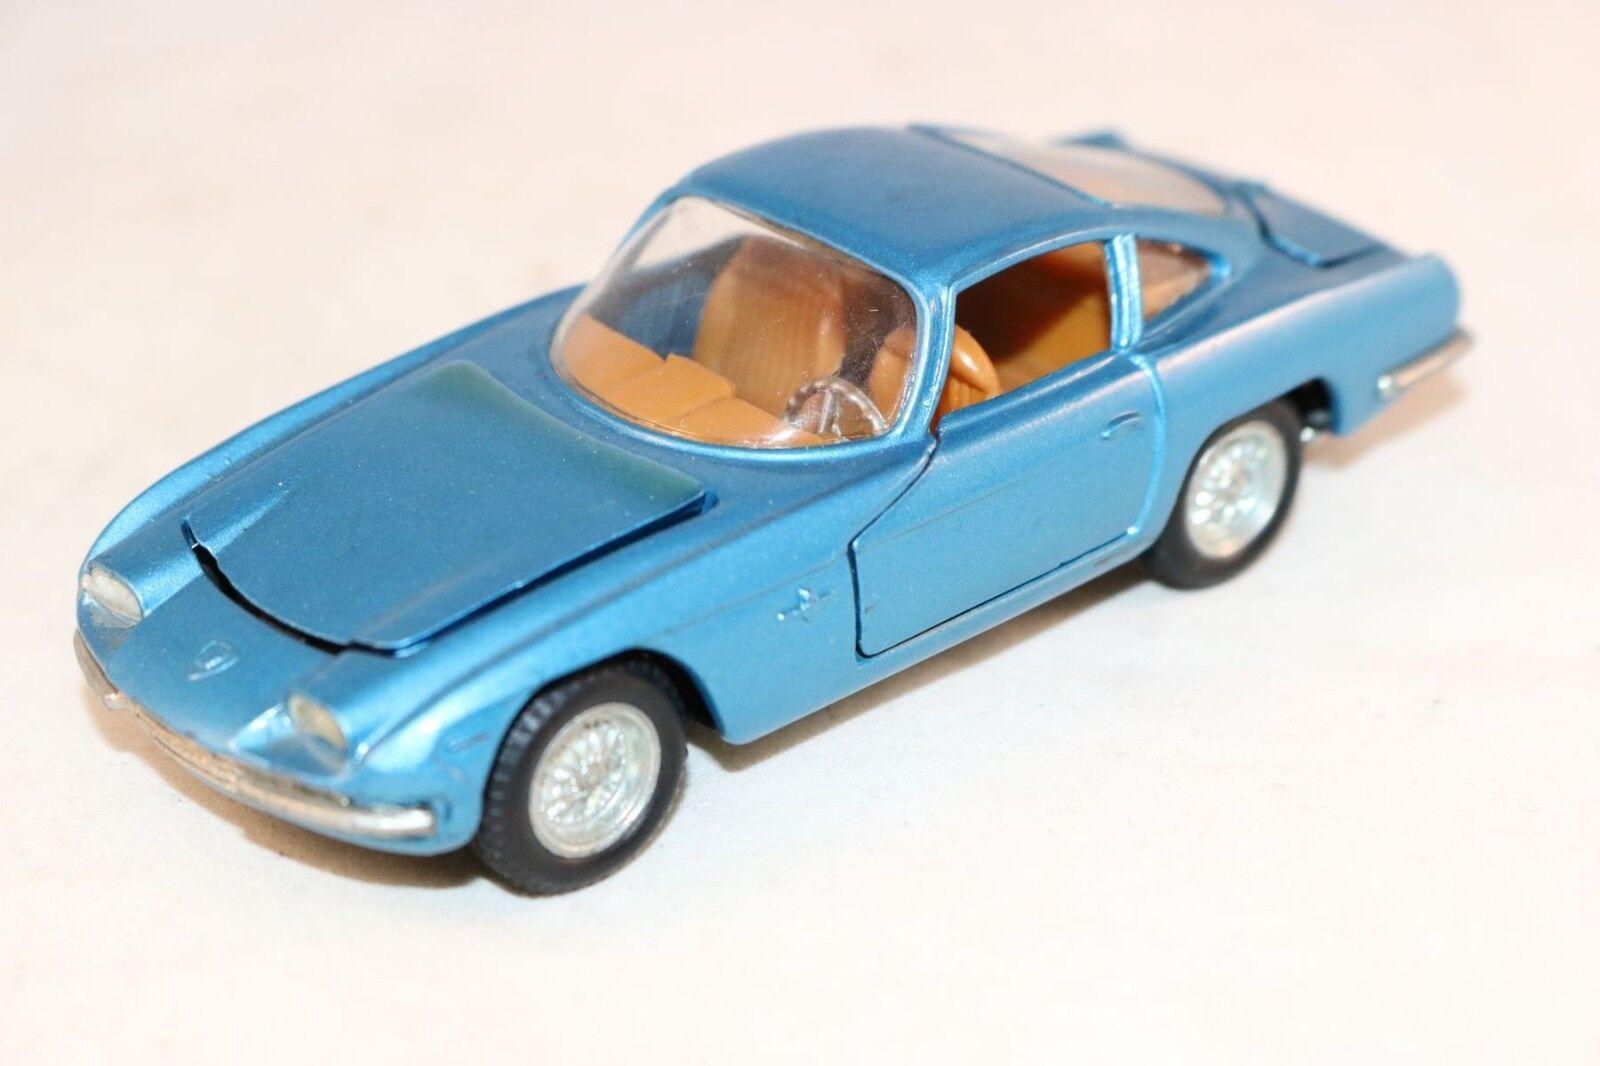 Politoys 539 Lamborghini bluee in mint all original condition very nice model